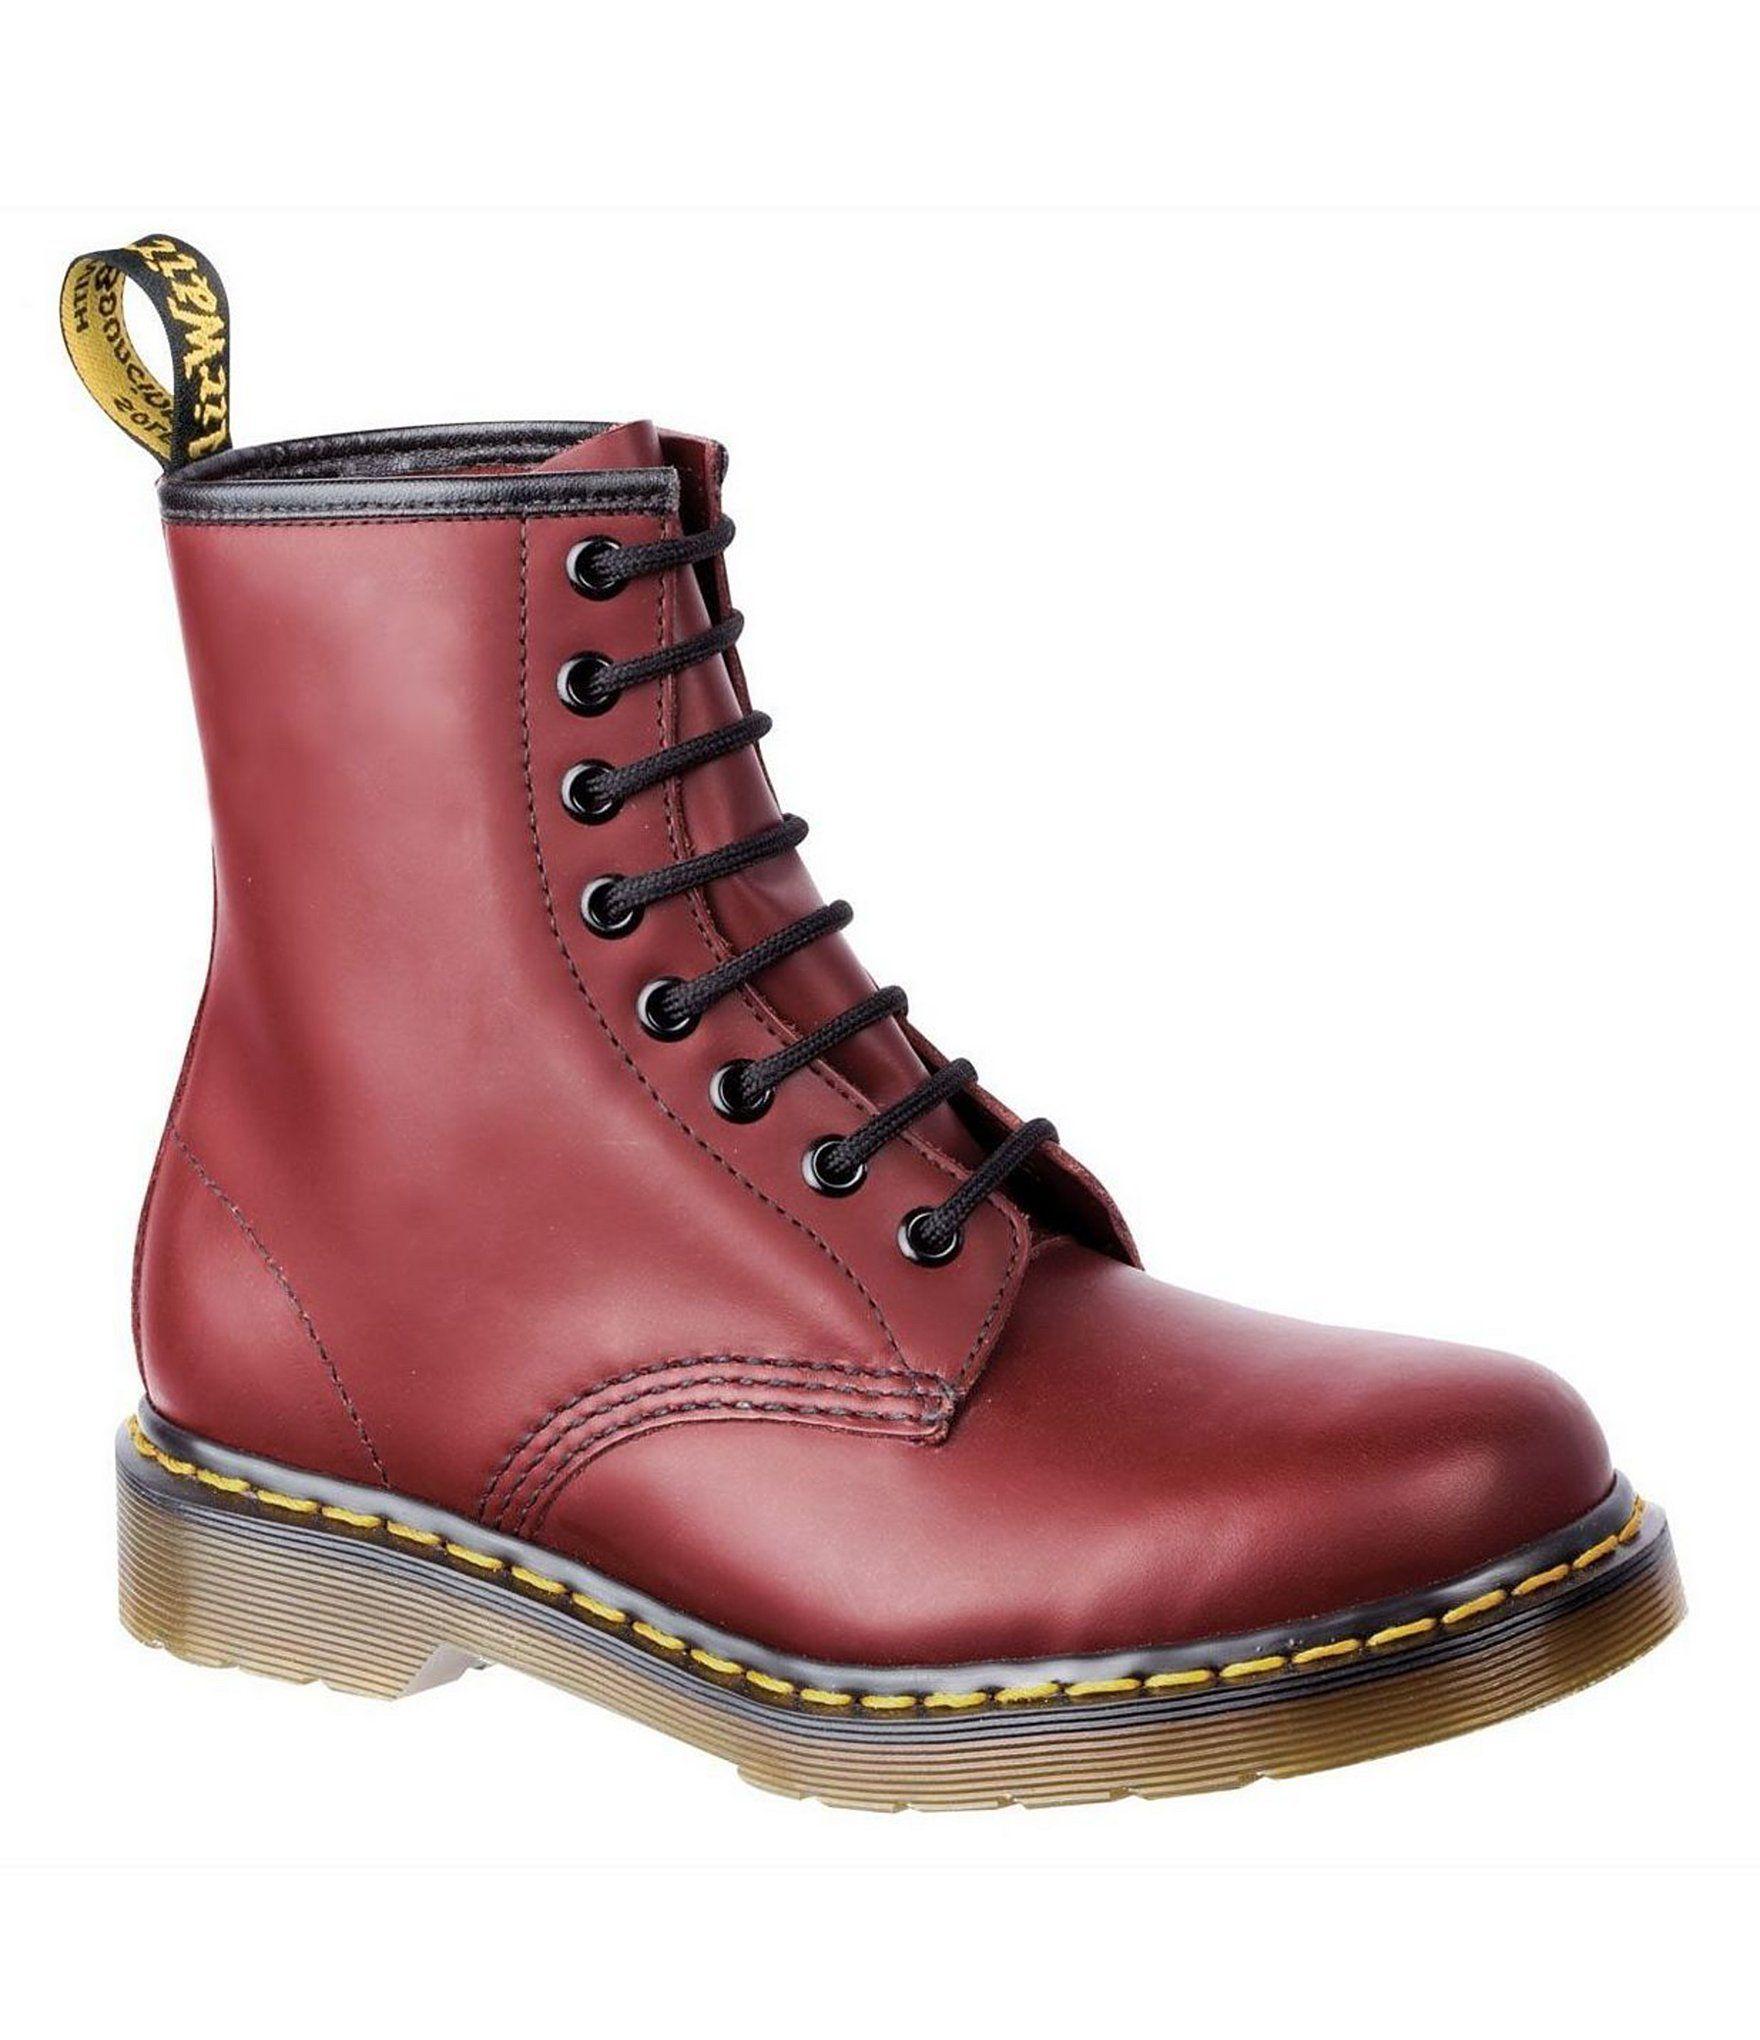 Dr. Martens 1460 Classic 8-Eye Combat Boots | Dillard's 31